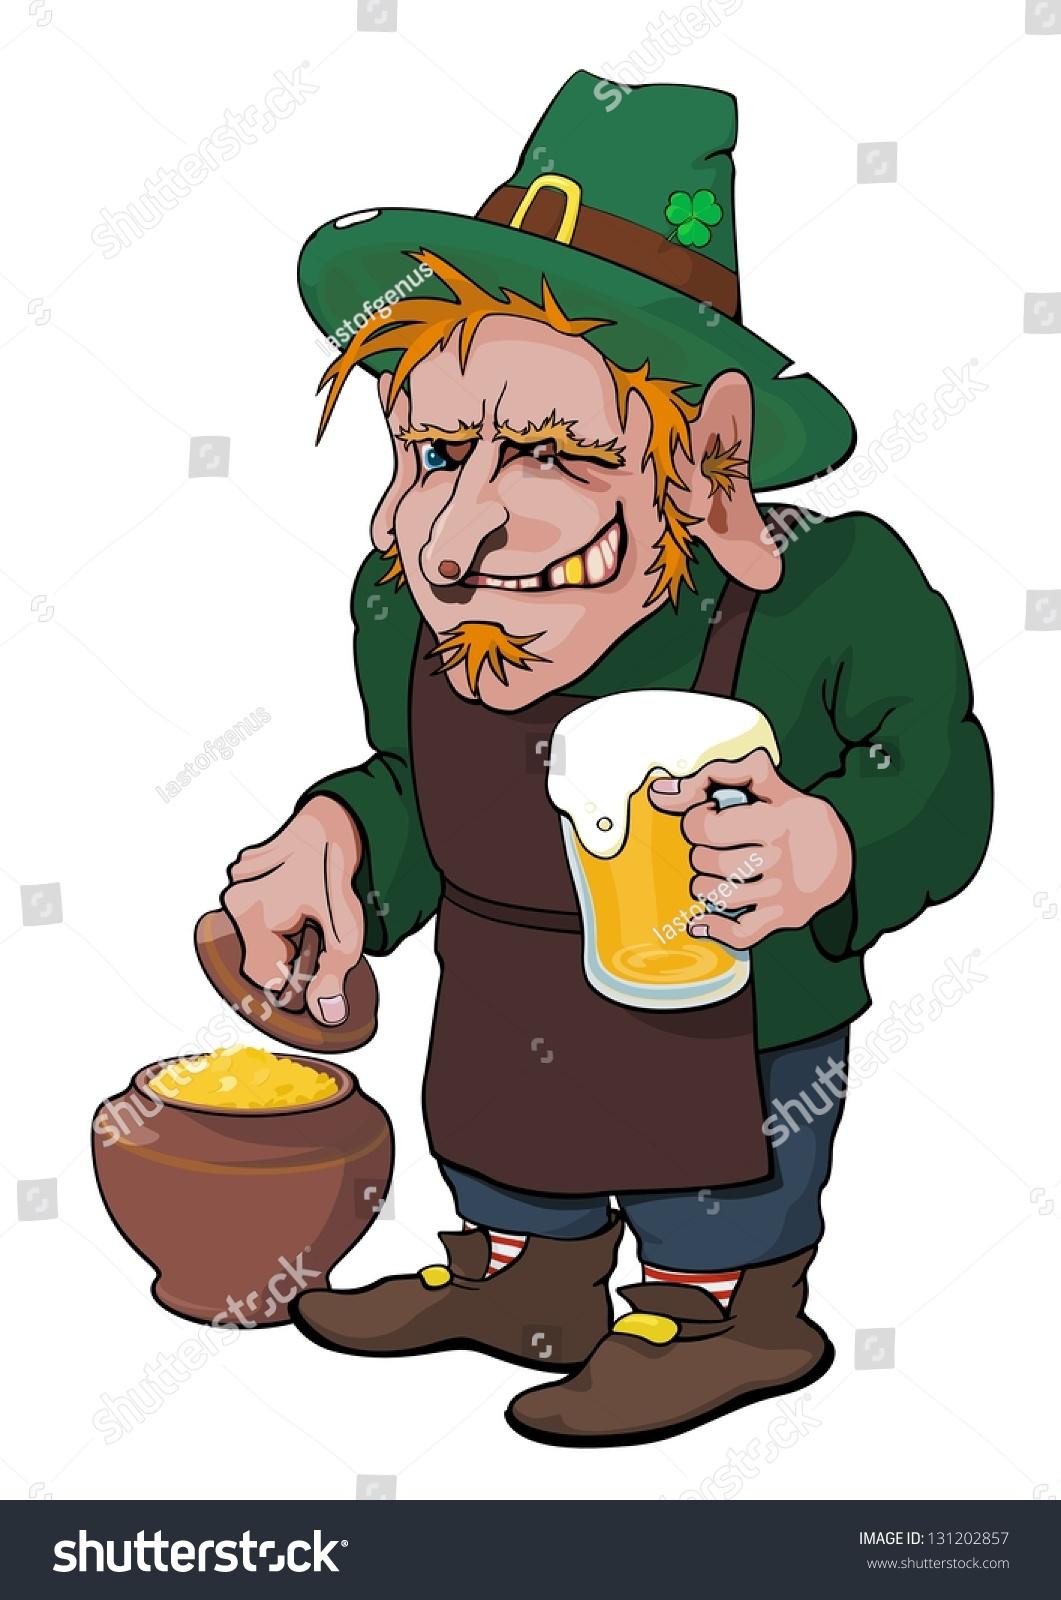 ugly smiling leprechaun beer shows pot stock illustration